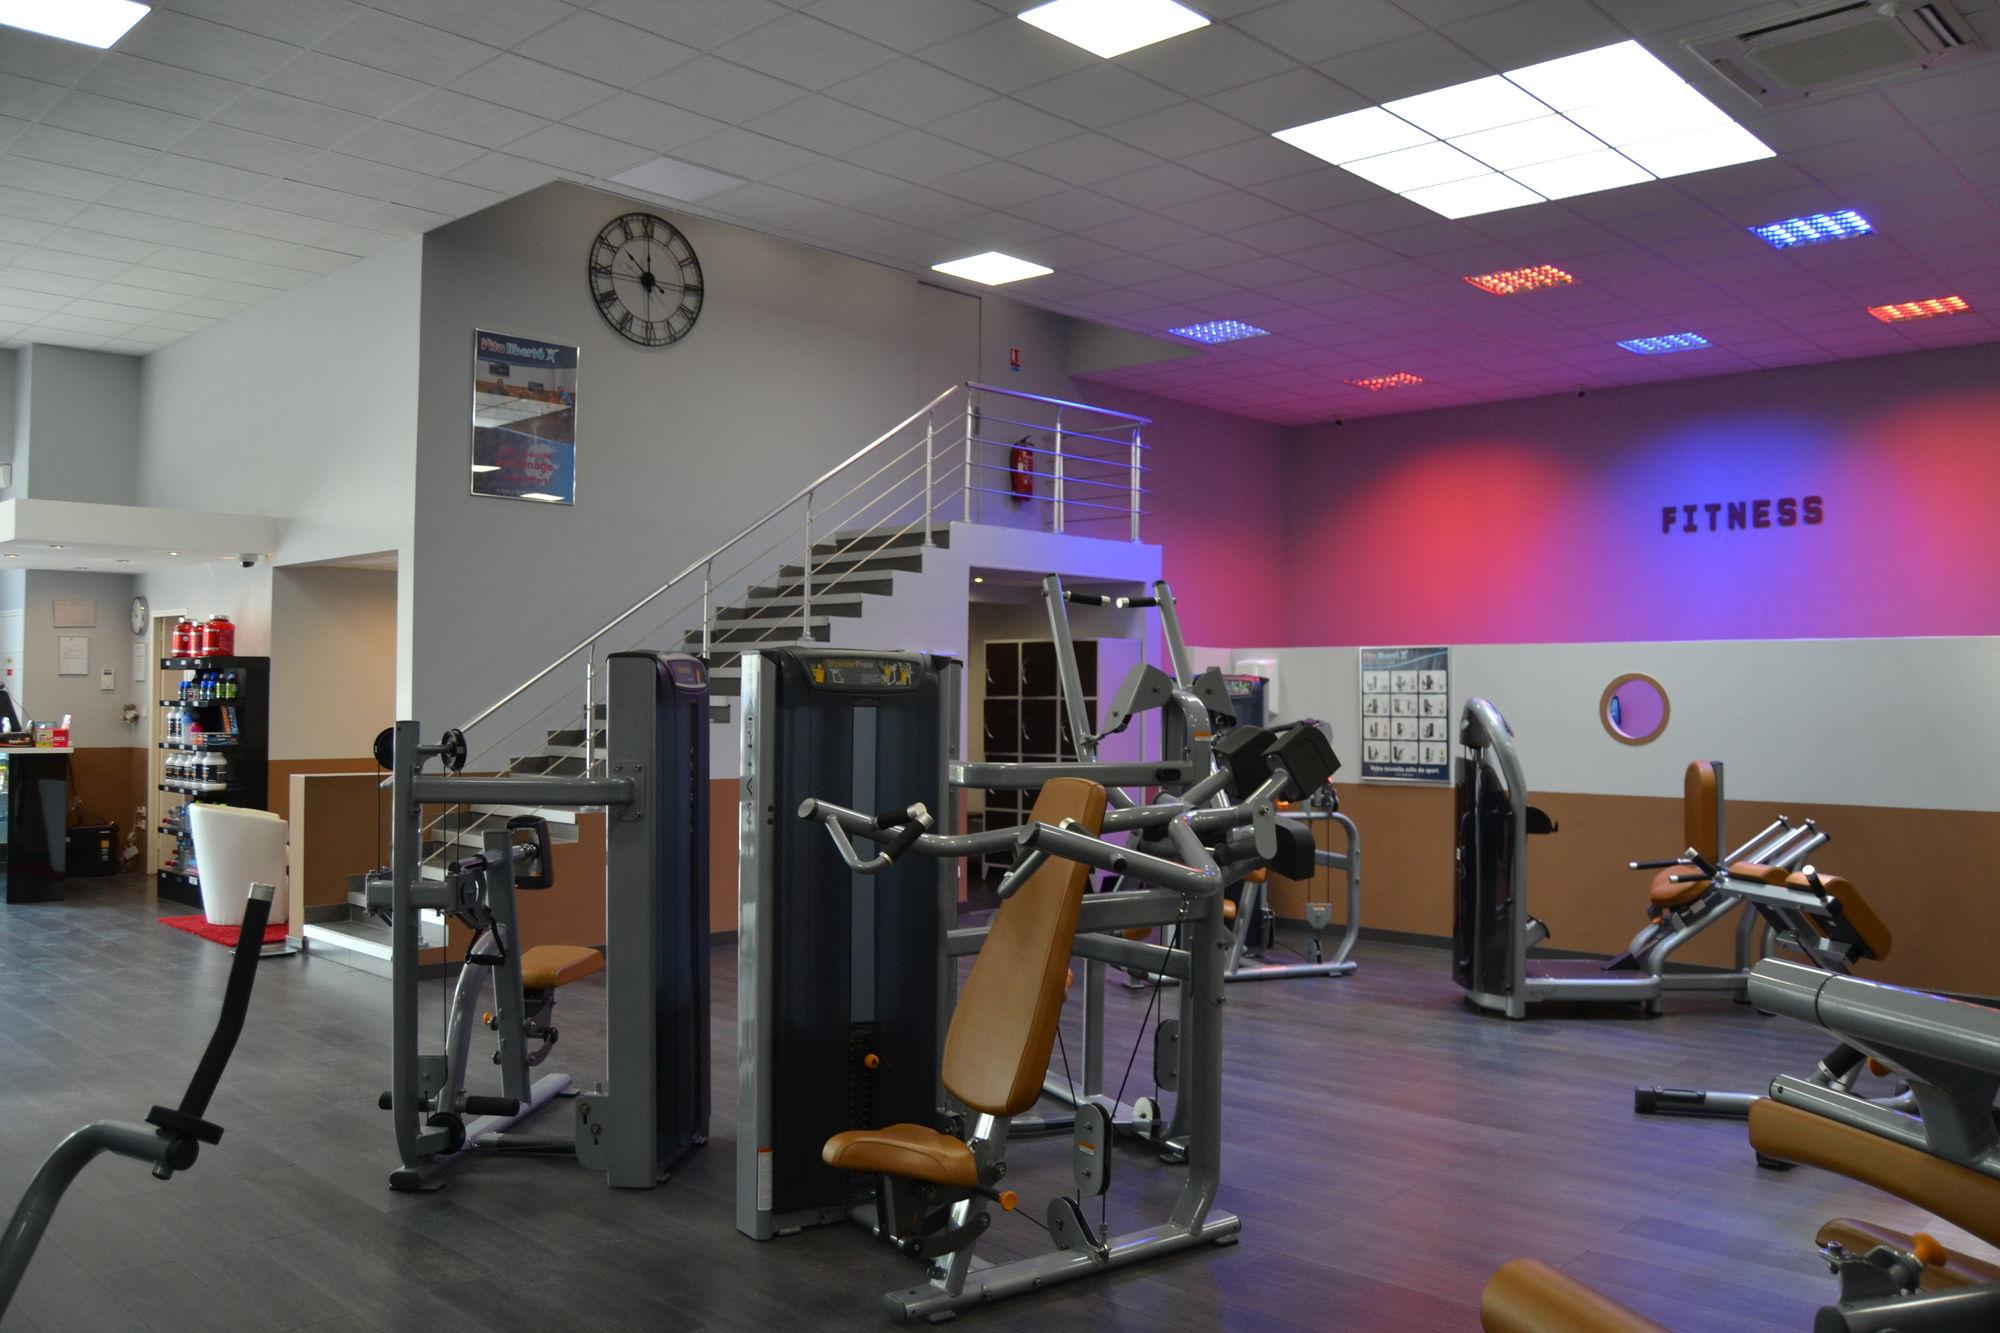 salle de sport design salle de sport design nos designs. Black Bedroom Furniture Sets. Home Design Ideas